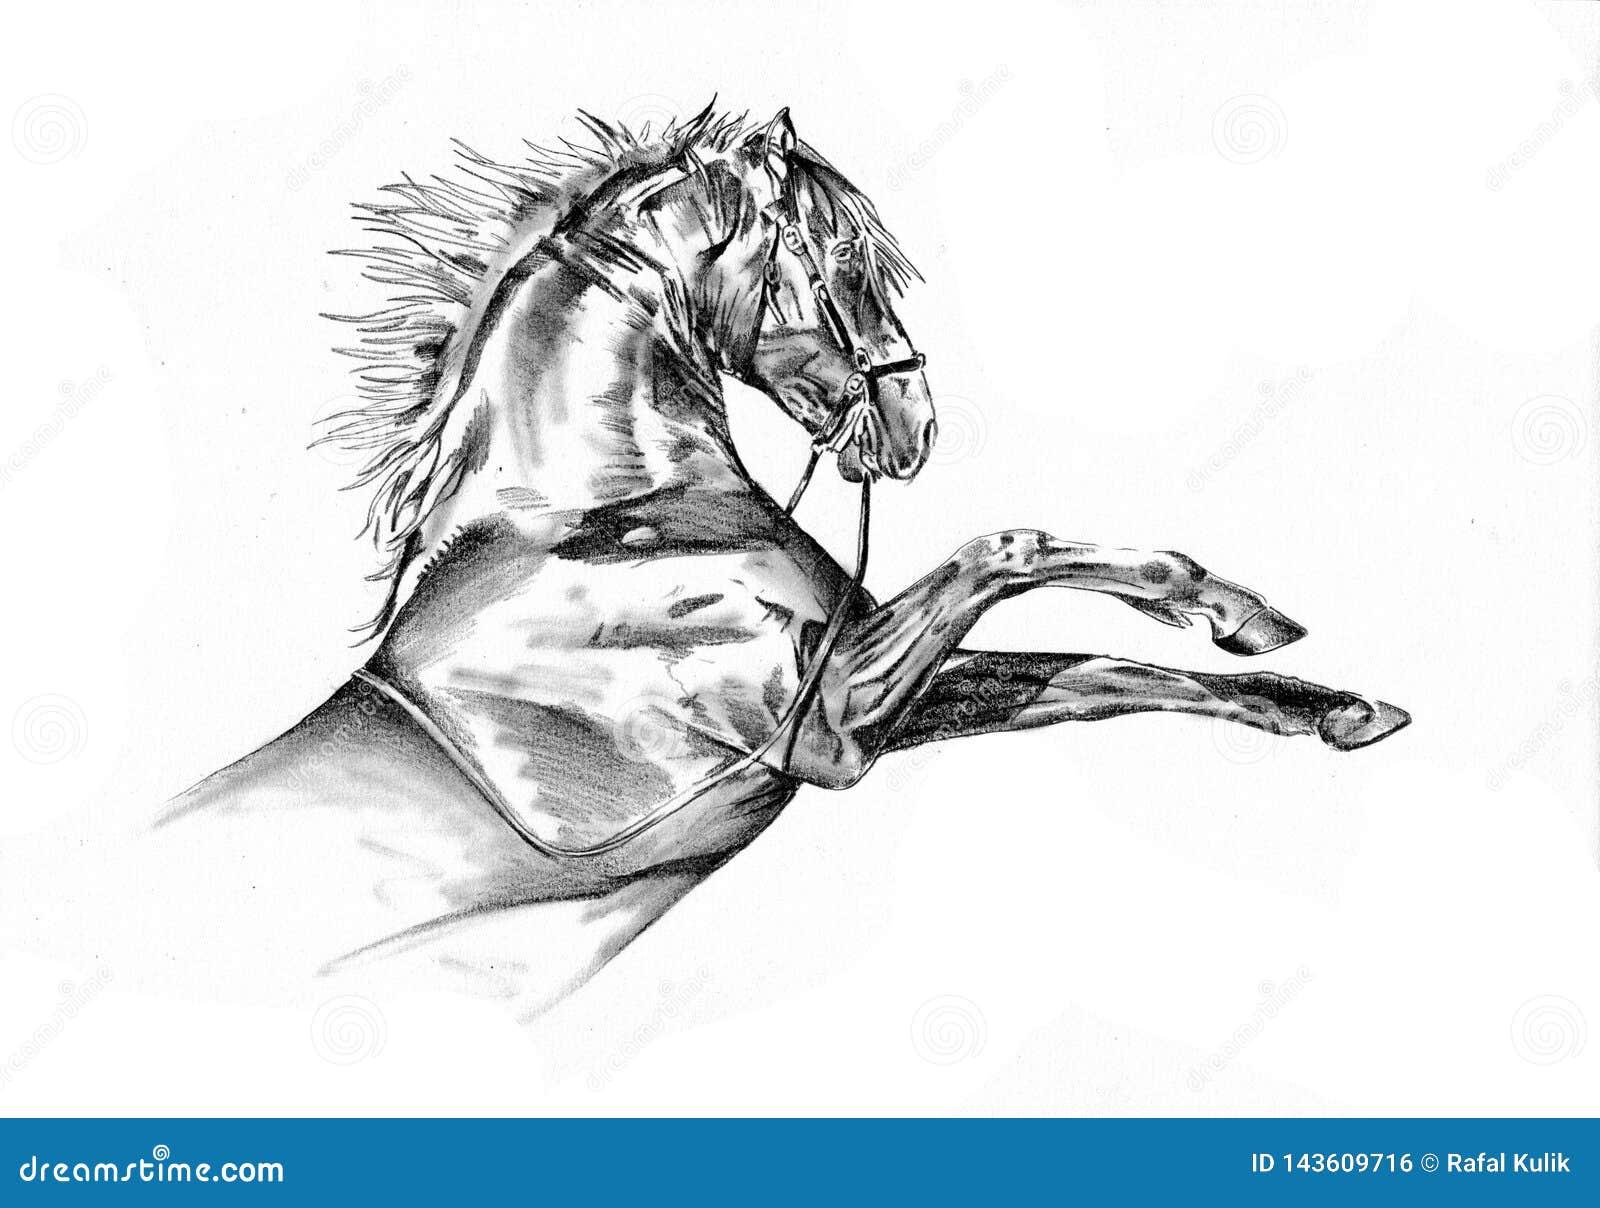 Freehand Horse Head Pencil Drawing Stock Illustration Illustration Of Monochrome Mammal 143609716